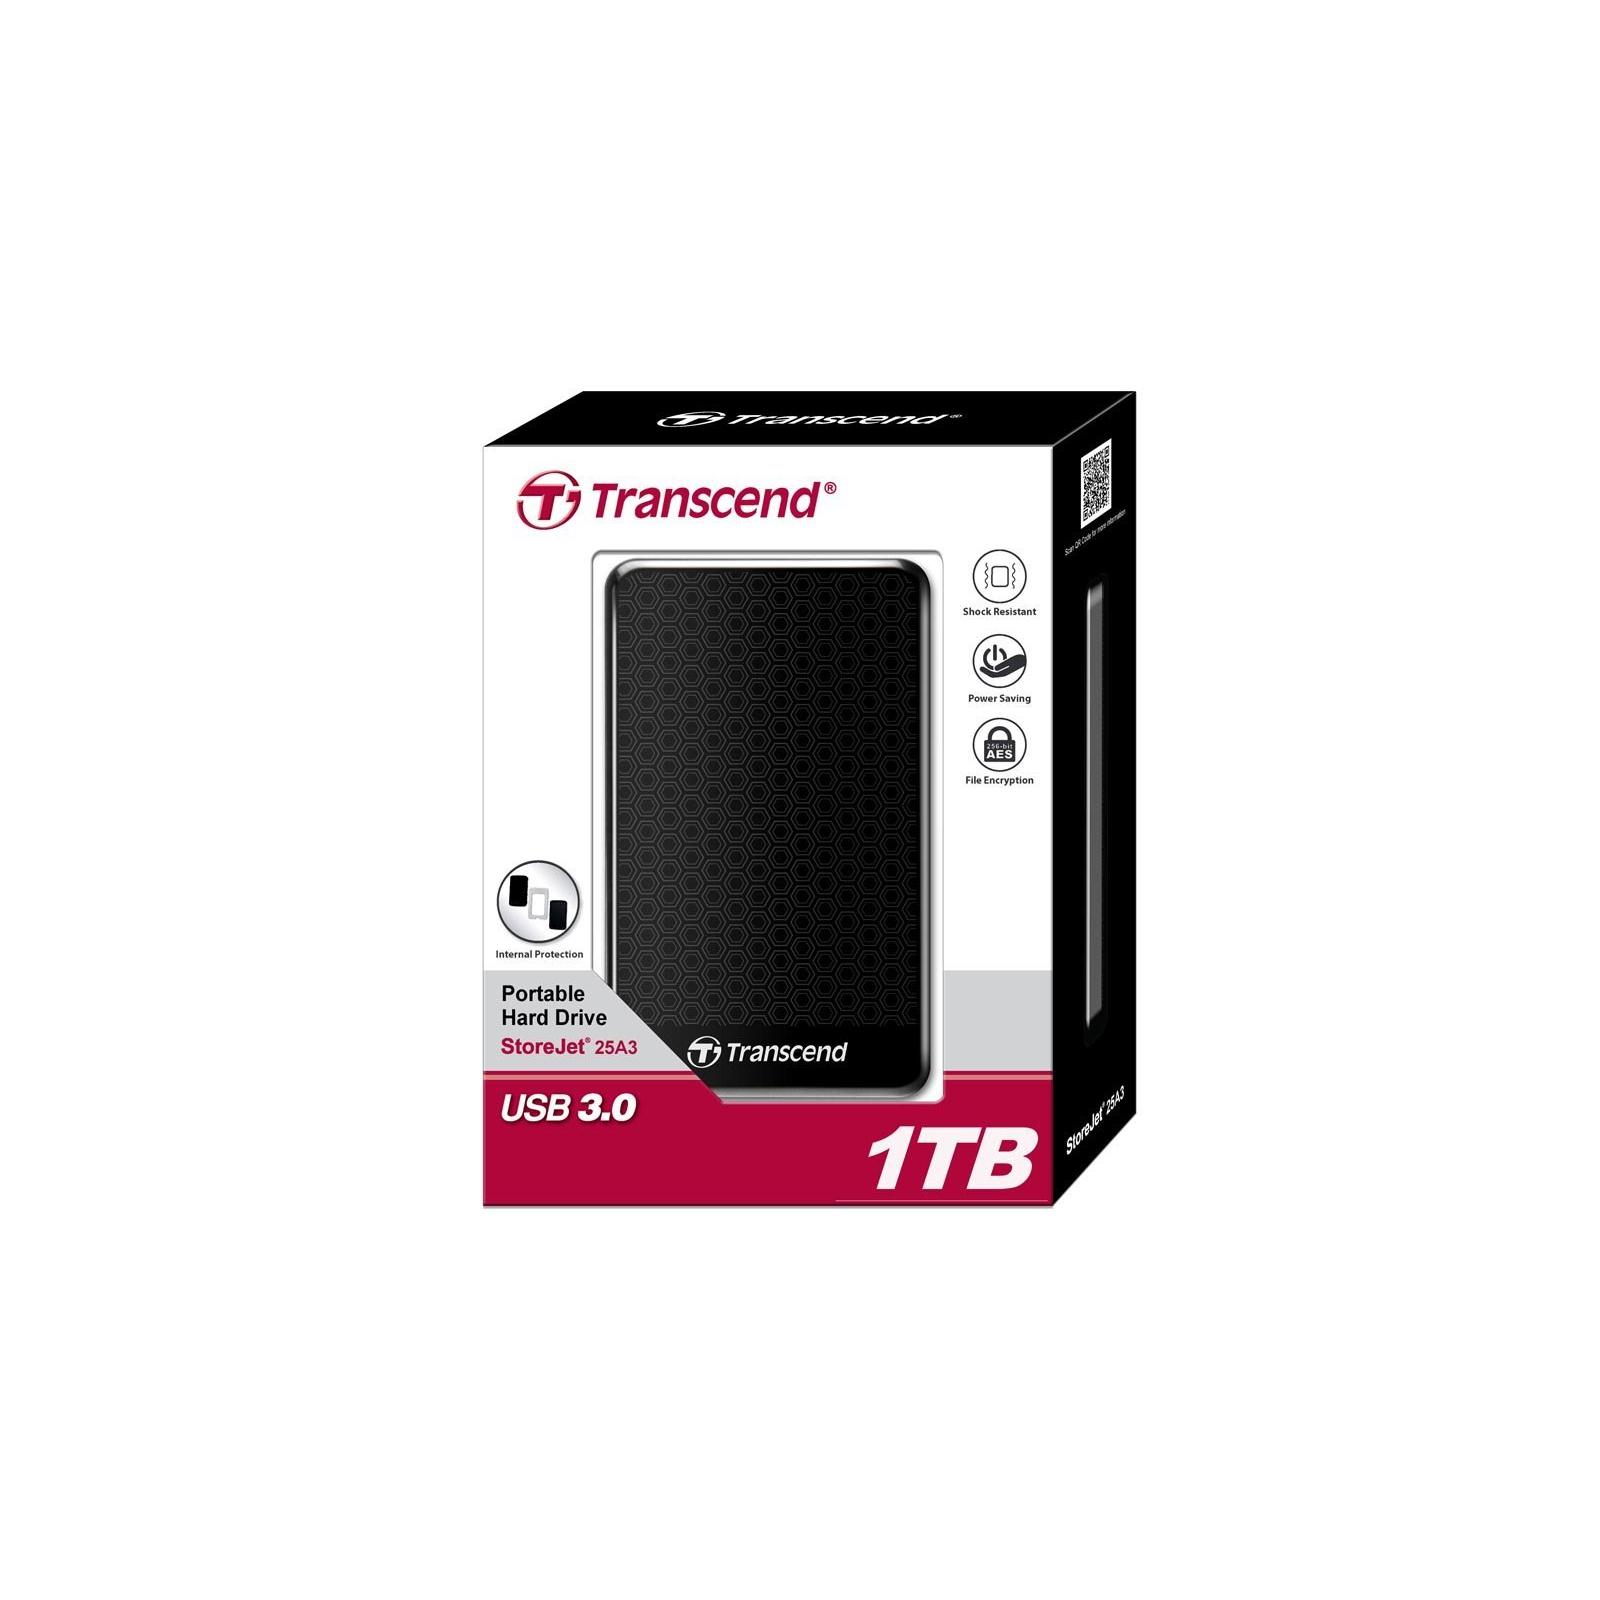 "Внешний жесткий диск 2.5"" 1TB Transcend (TS1TSJ25A3K) изображение 3"